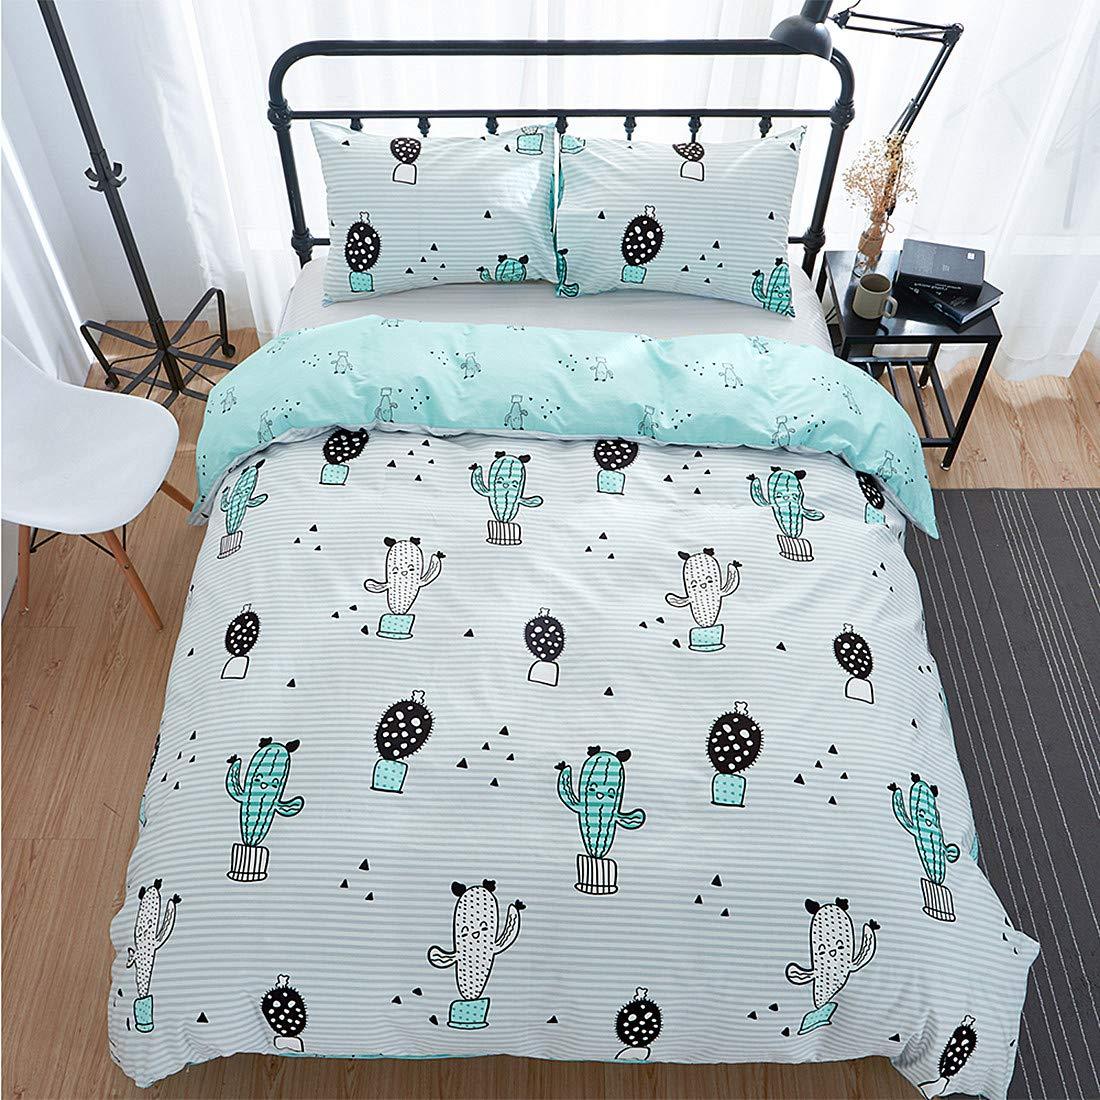 Jumeey Cartoon Cactus Duvet Cover Queen Reversible Striped Bedding Sets Full 100% Cotton 3 Piece Kids Teen Girls Boys Duvet Cover Set with Zipper Closure,Soft,Breathable,No Comforter